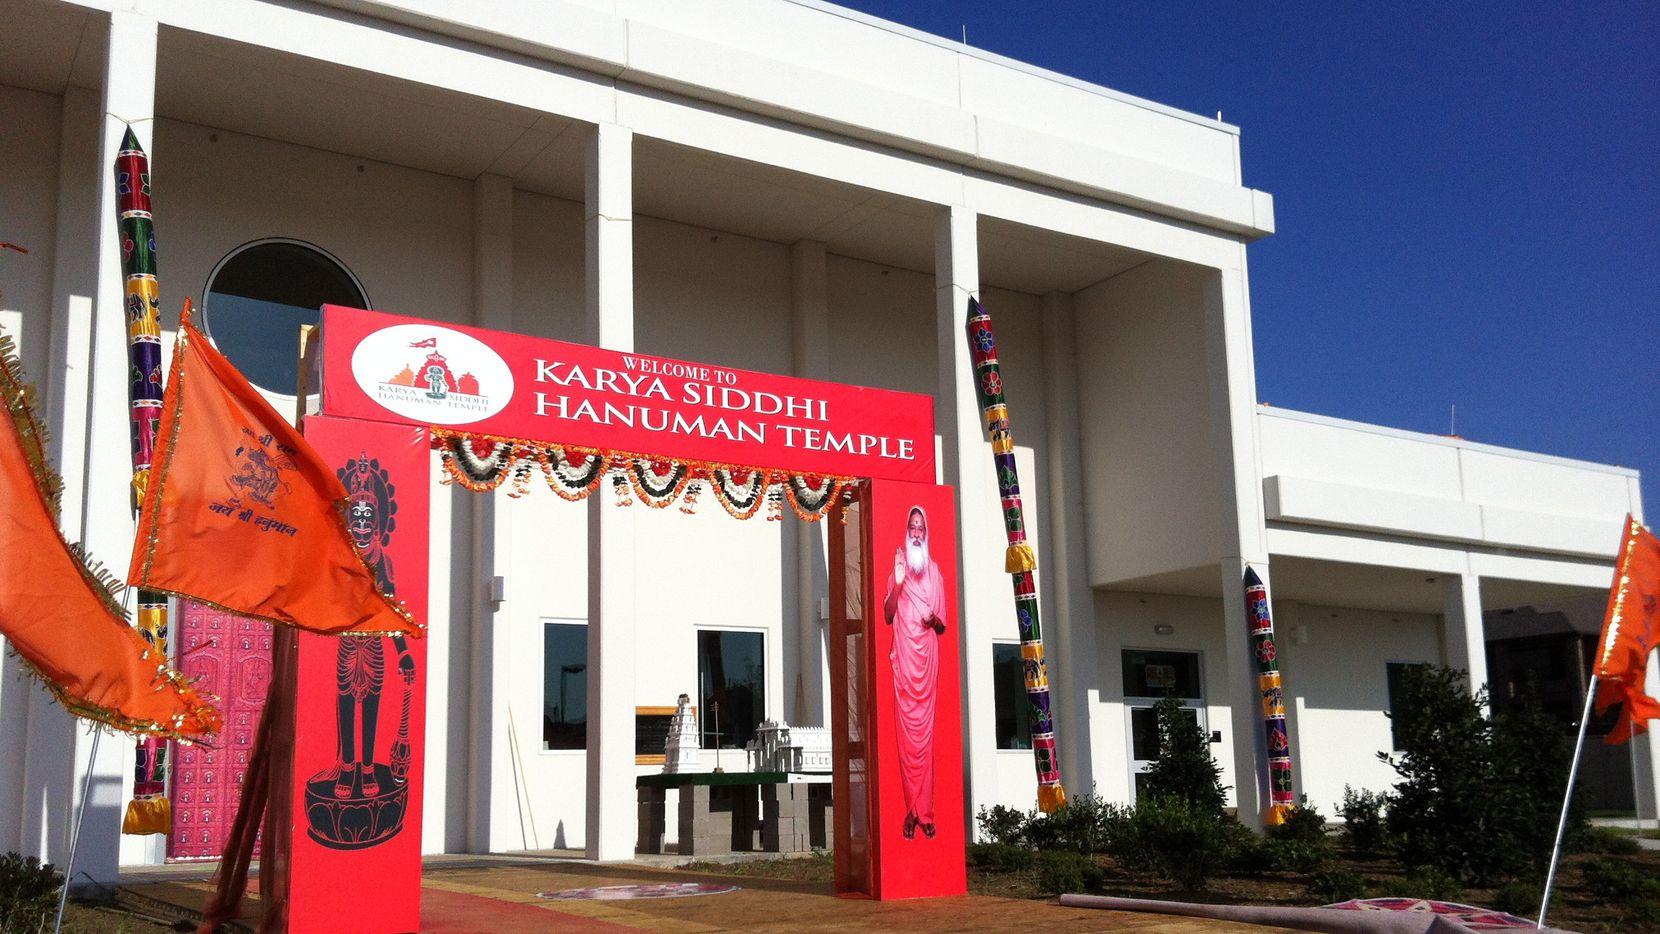 The new Karya Siddhi Hanuman Temple serves the area's growing Asian Indian population.